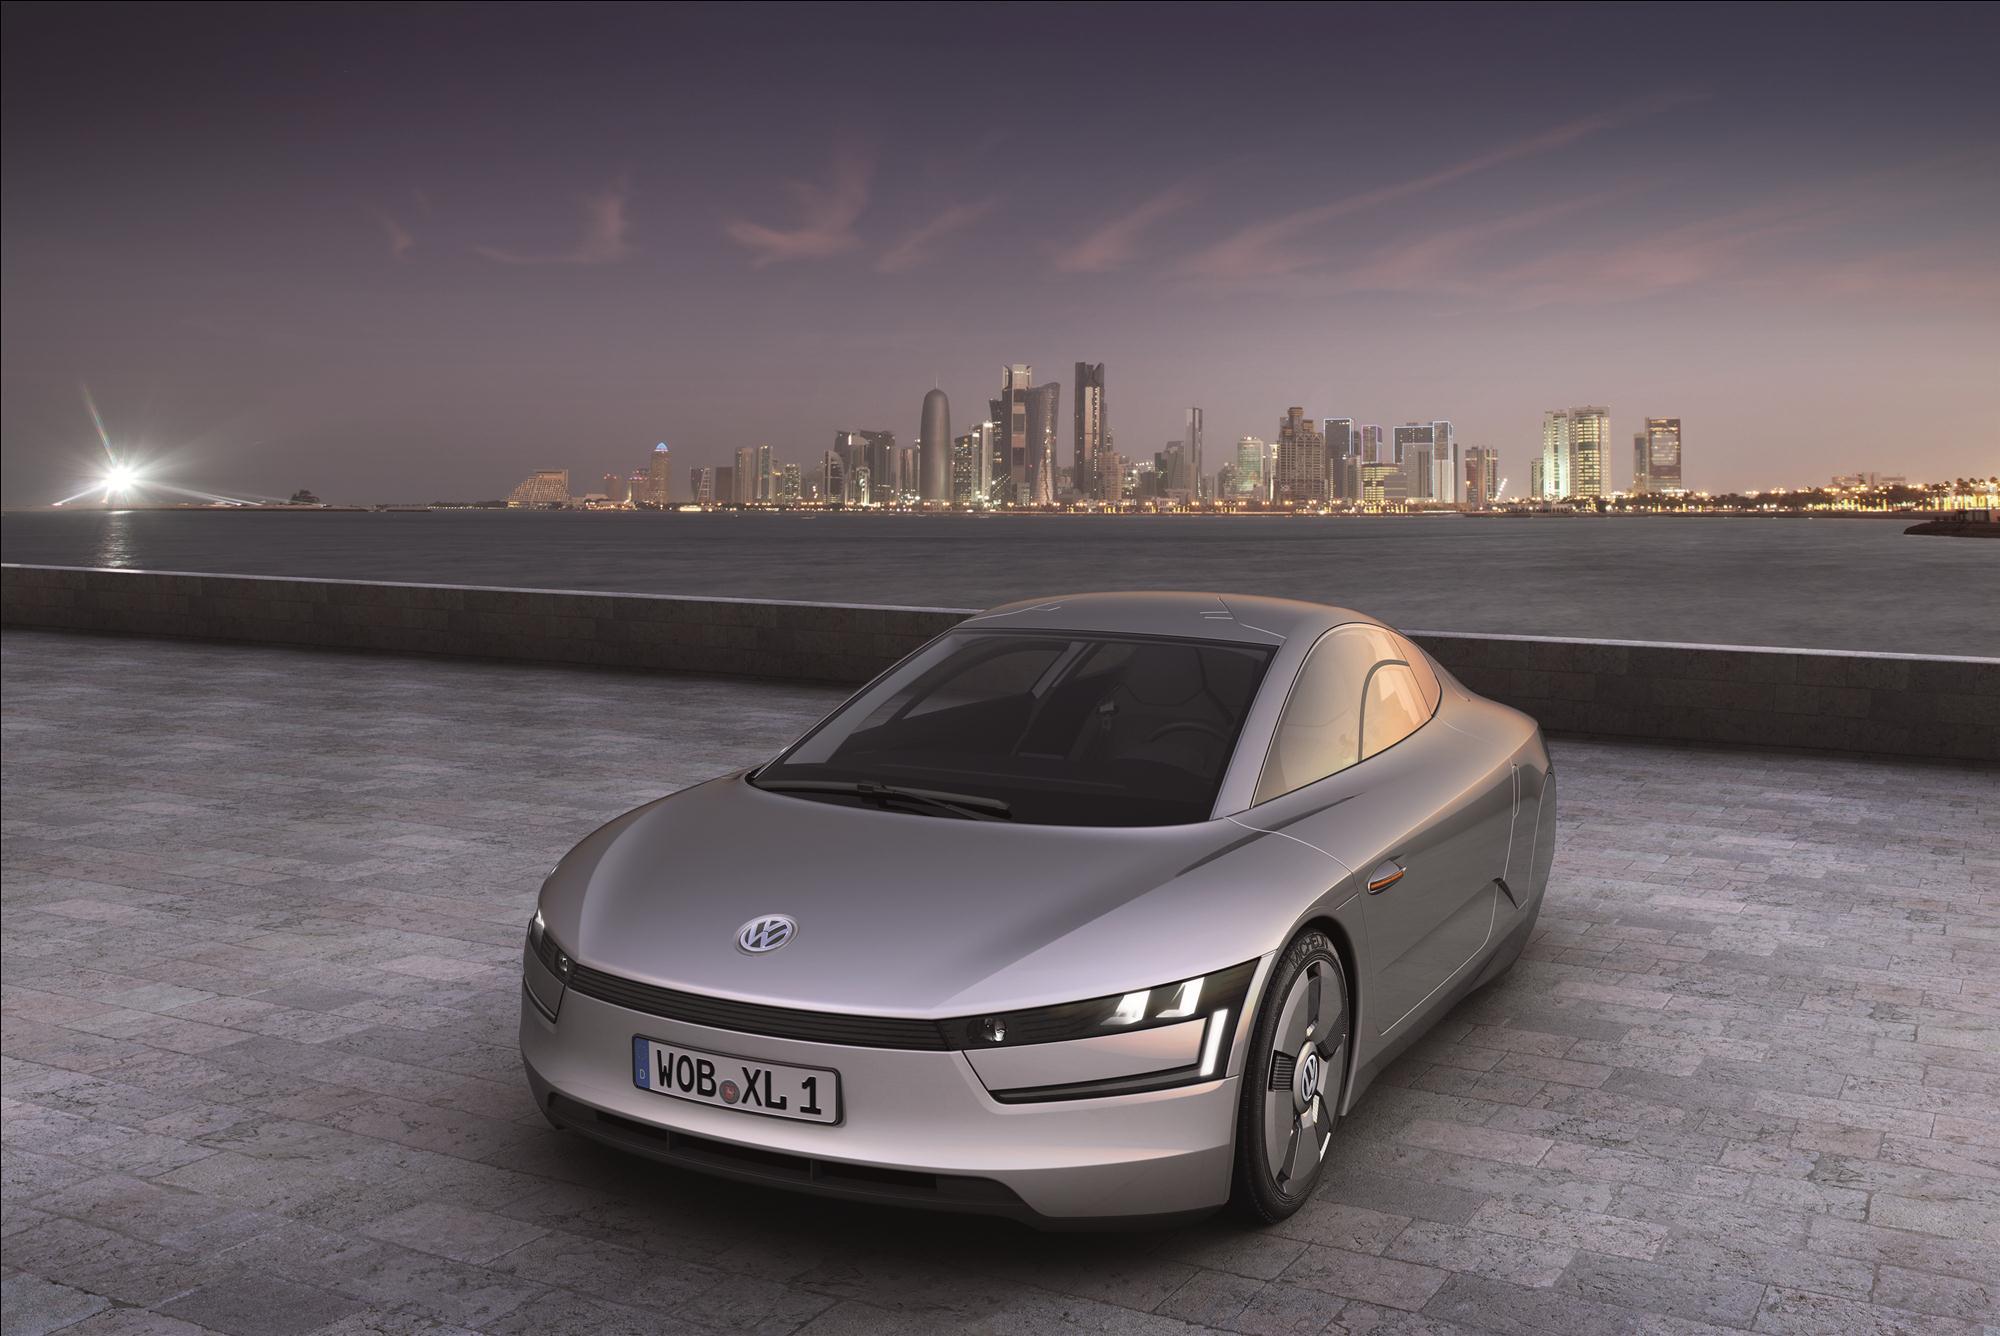 Volkswagen Says It Will Build 2 Seat 260 Mpg Plug In Hybrid